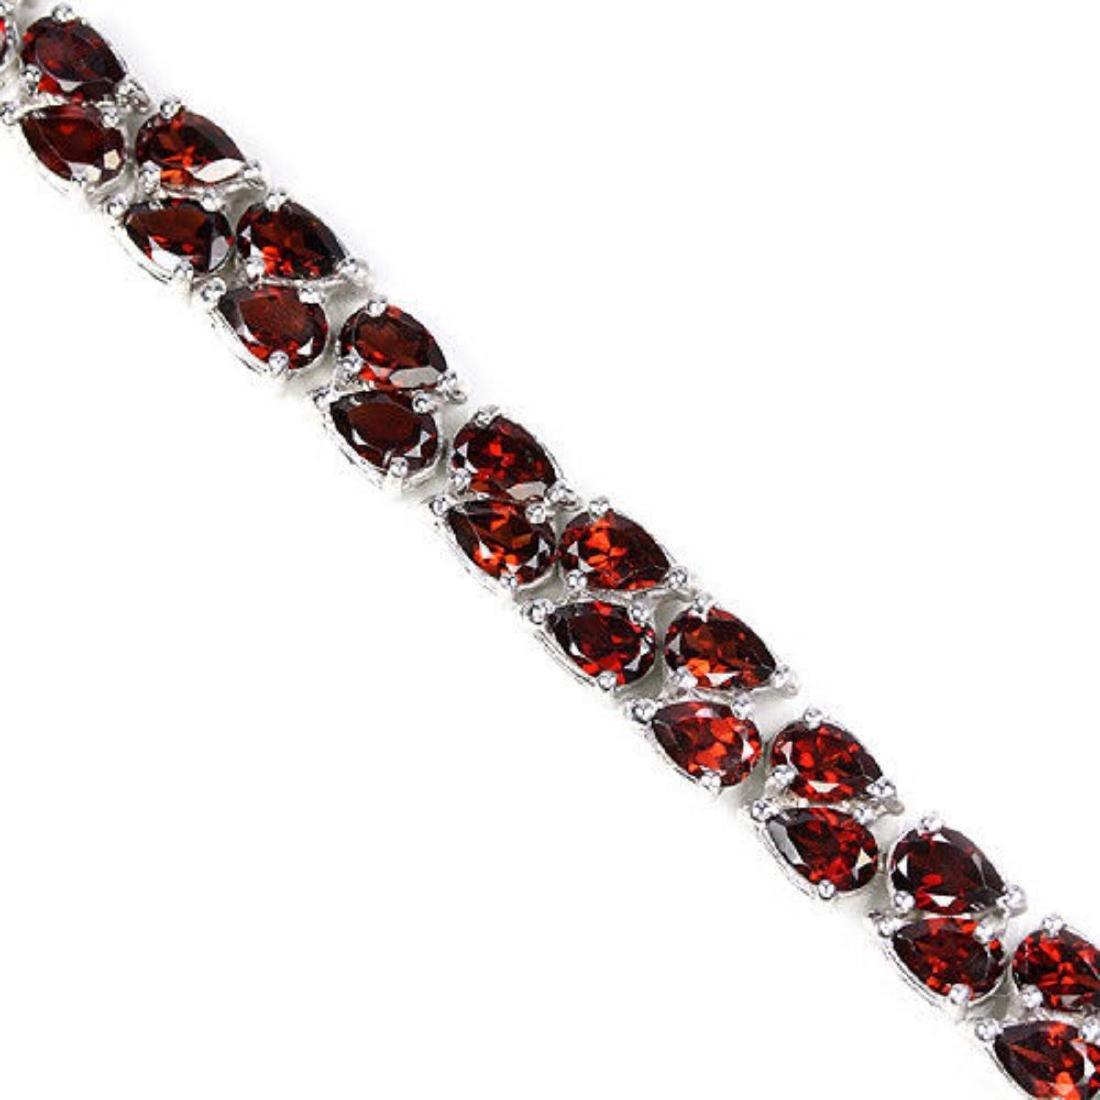 NATURAL AAA DARK ORANGE RED GARNET Bracelet - 2